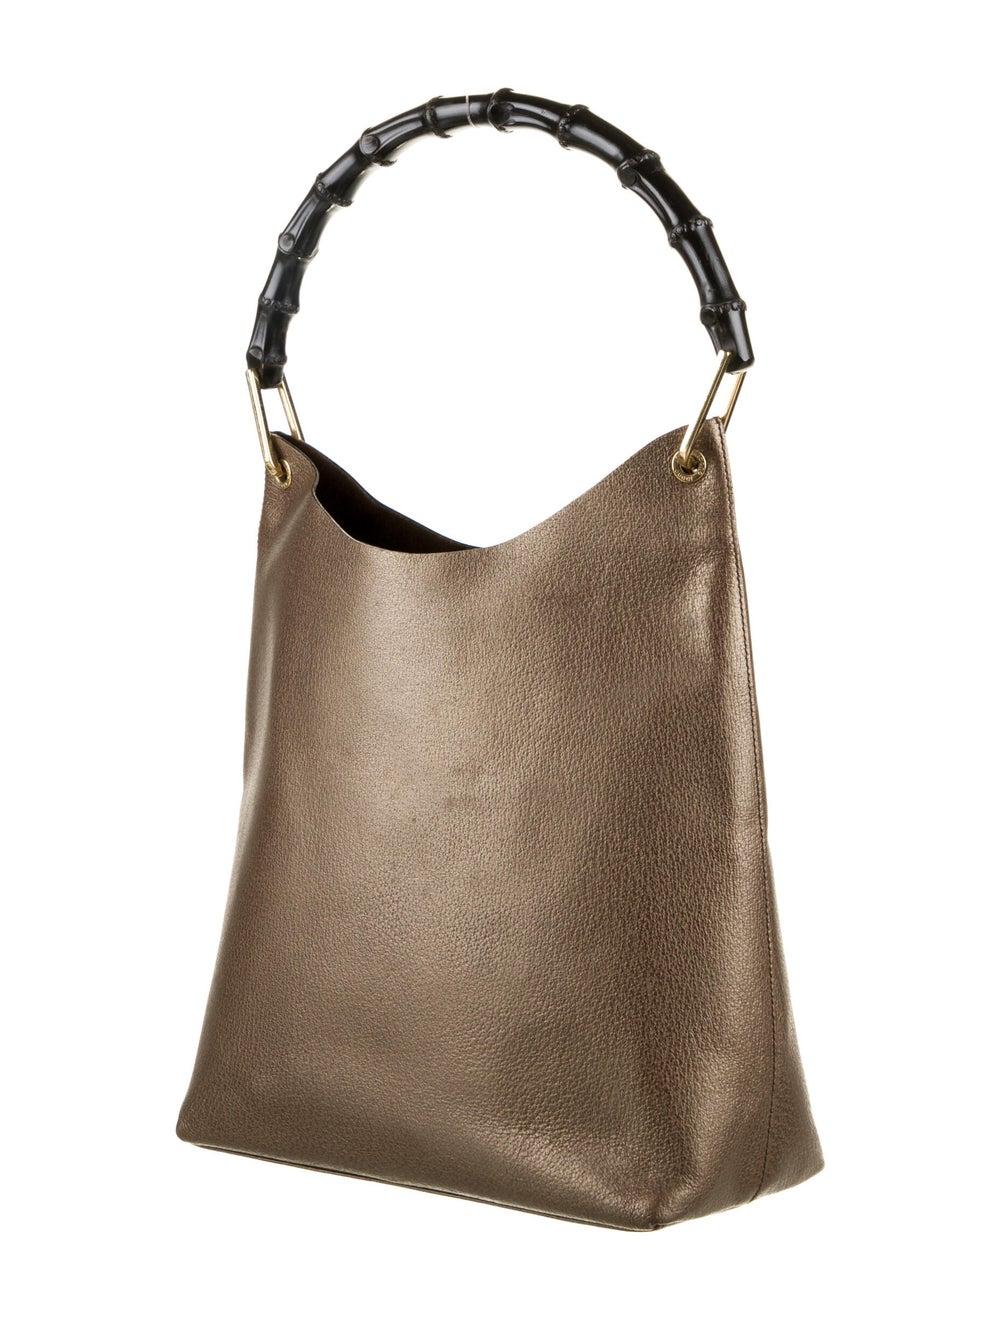 Gucci Bamboo Handle Leather Hobo Brown - image 3